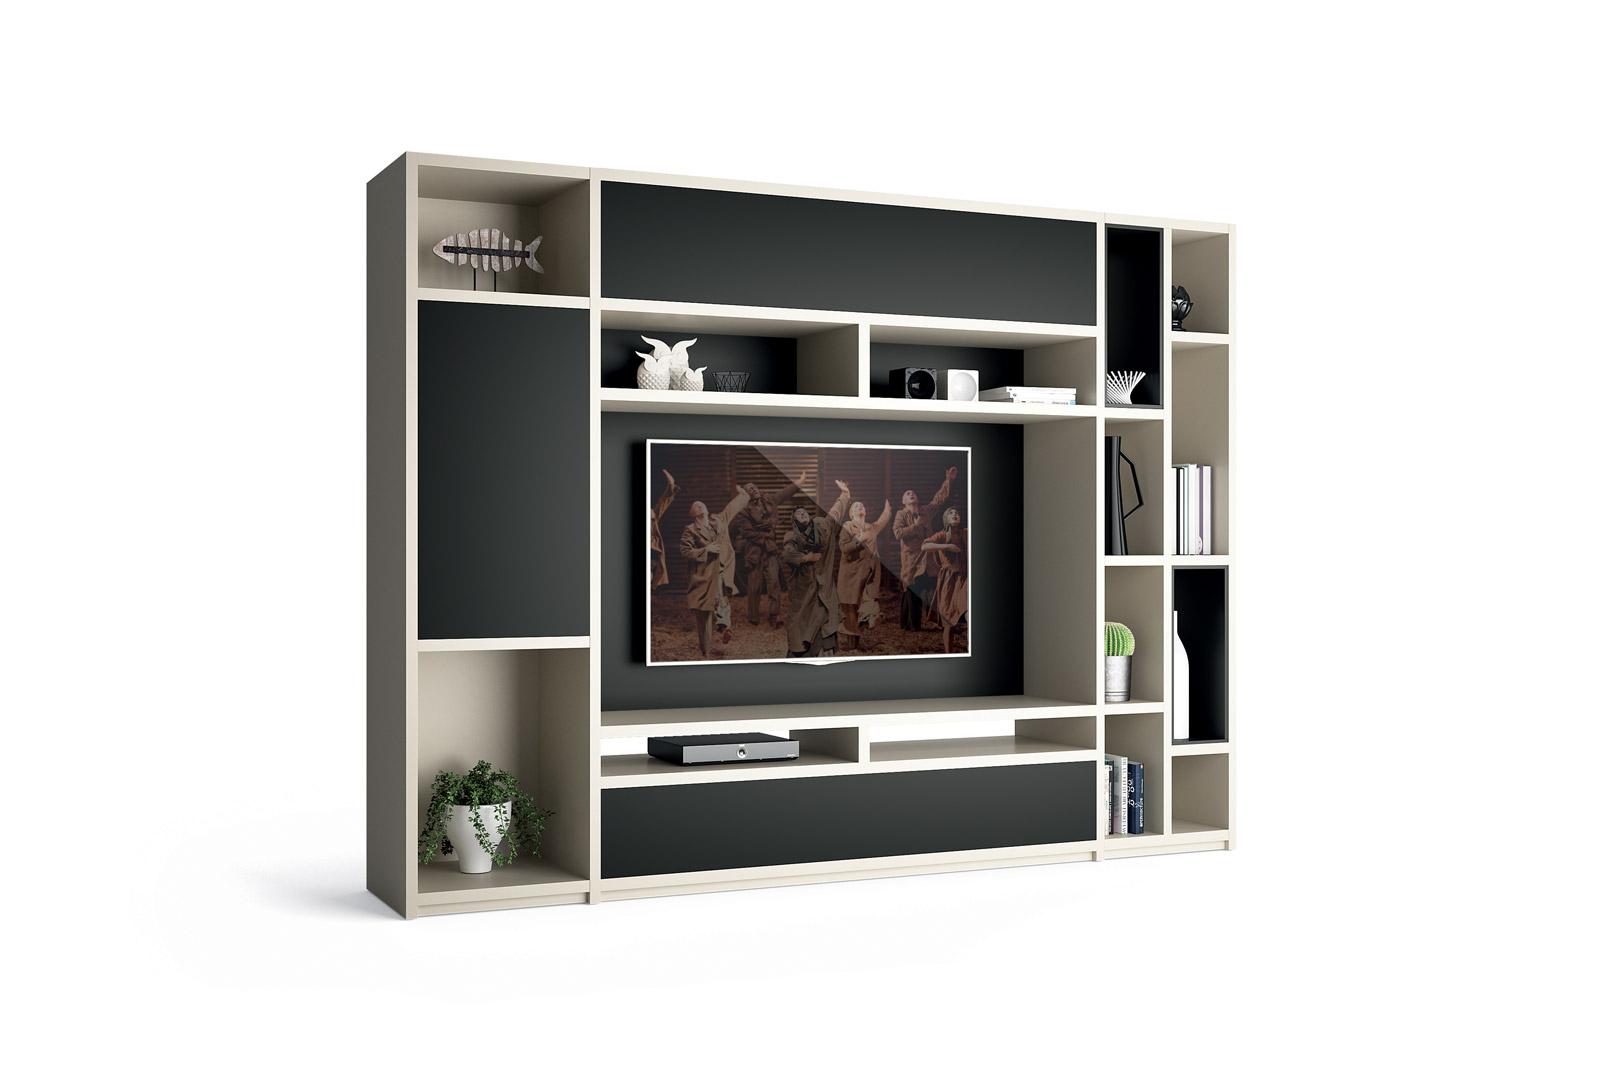 meuble de salon regency composition murale homesalons. Black Bedroom Furniture Sets. Home Design Ideas